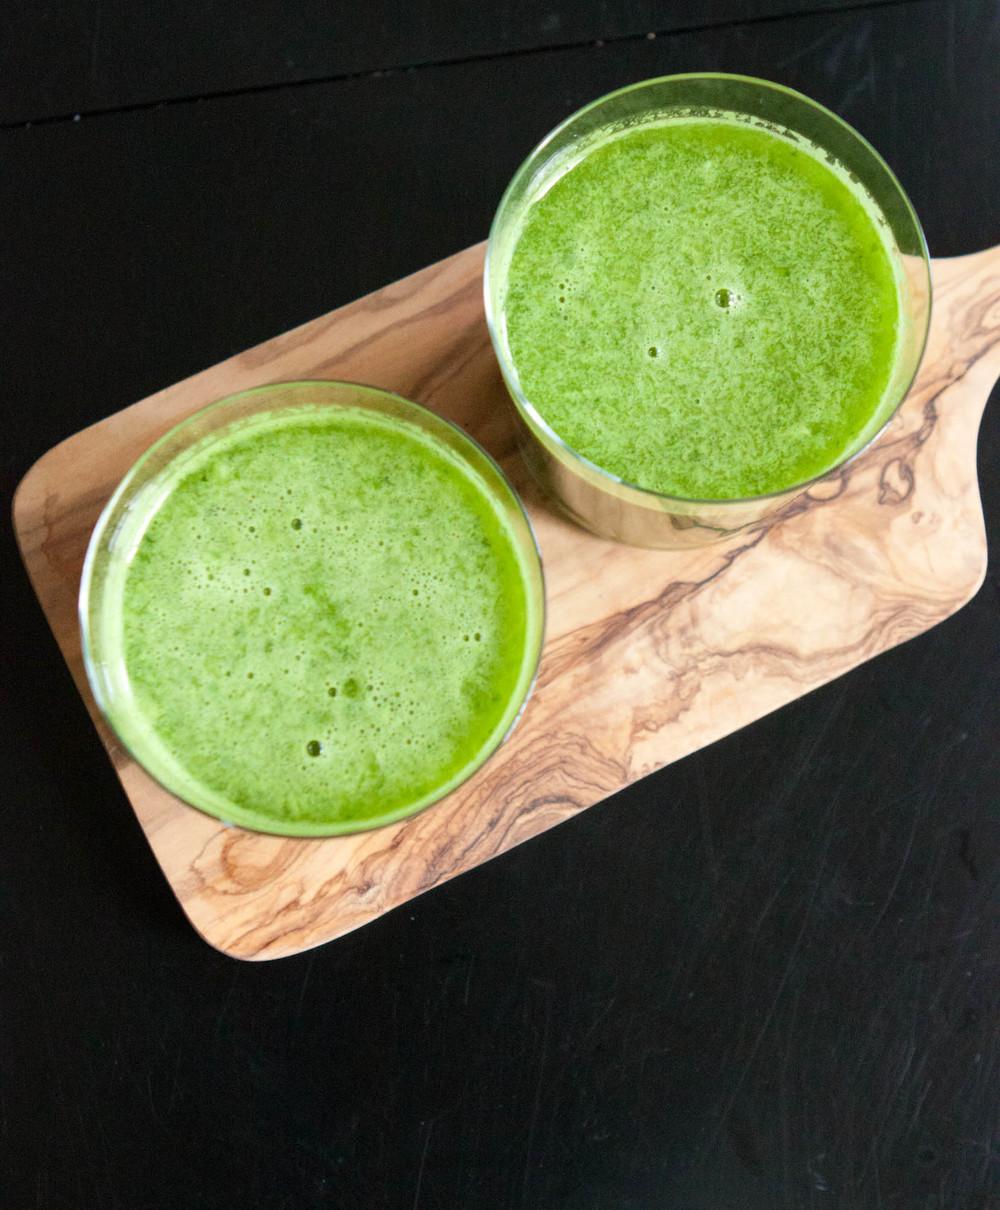 pineapple kale juice-7.jpg